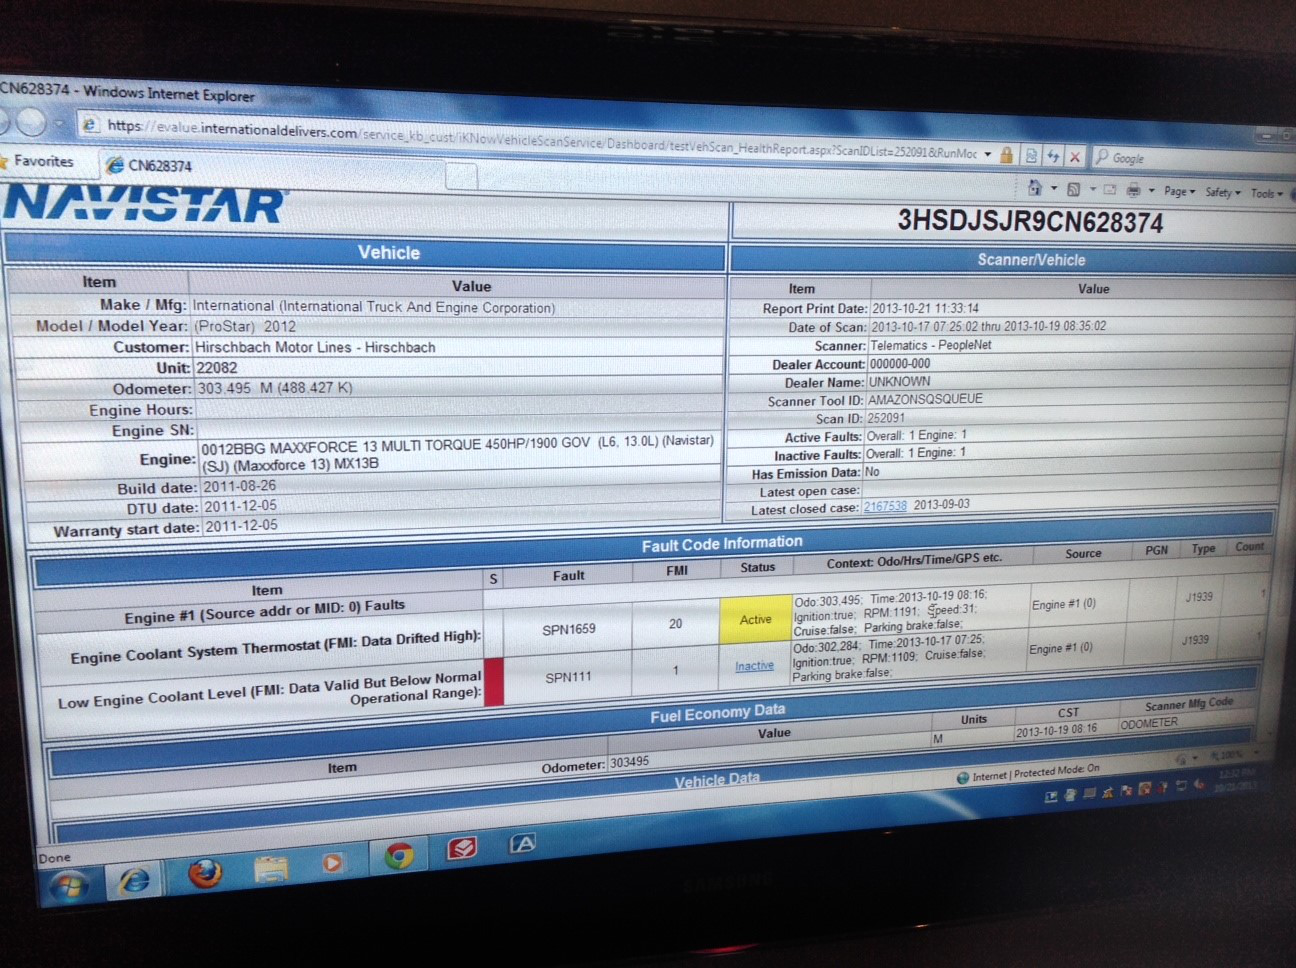 Navistar remote diagnostics system hits 200,000 vehicle milestone